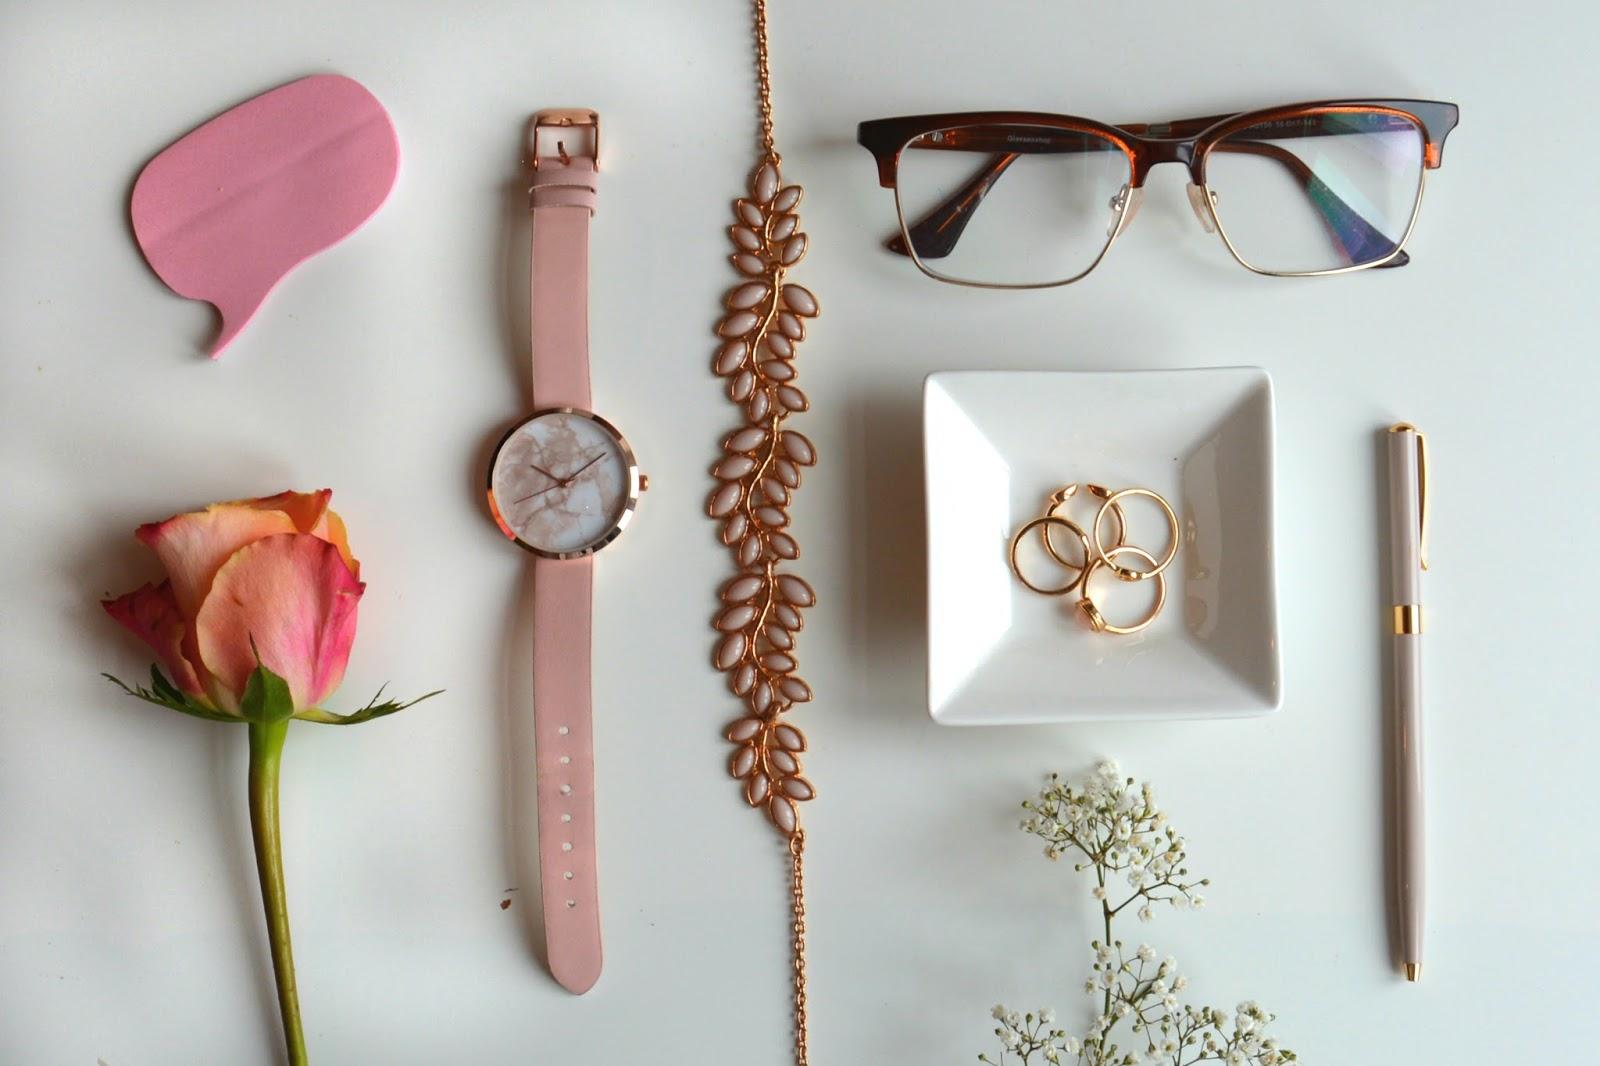 Fresh Flowers, Asos Watch, Pen, Primark Necklace, Primark Rings, GlassesShop.com glasses